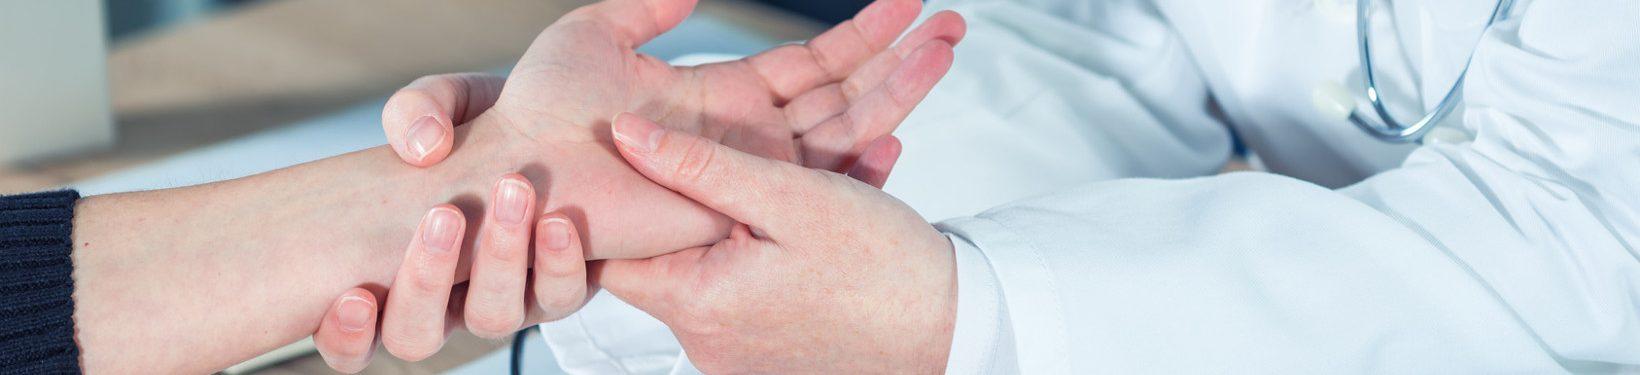 Poradnia Ortopedii i Traumatologii Narządu Ruchu